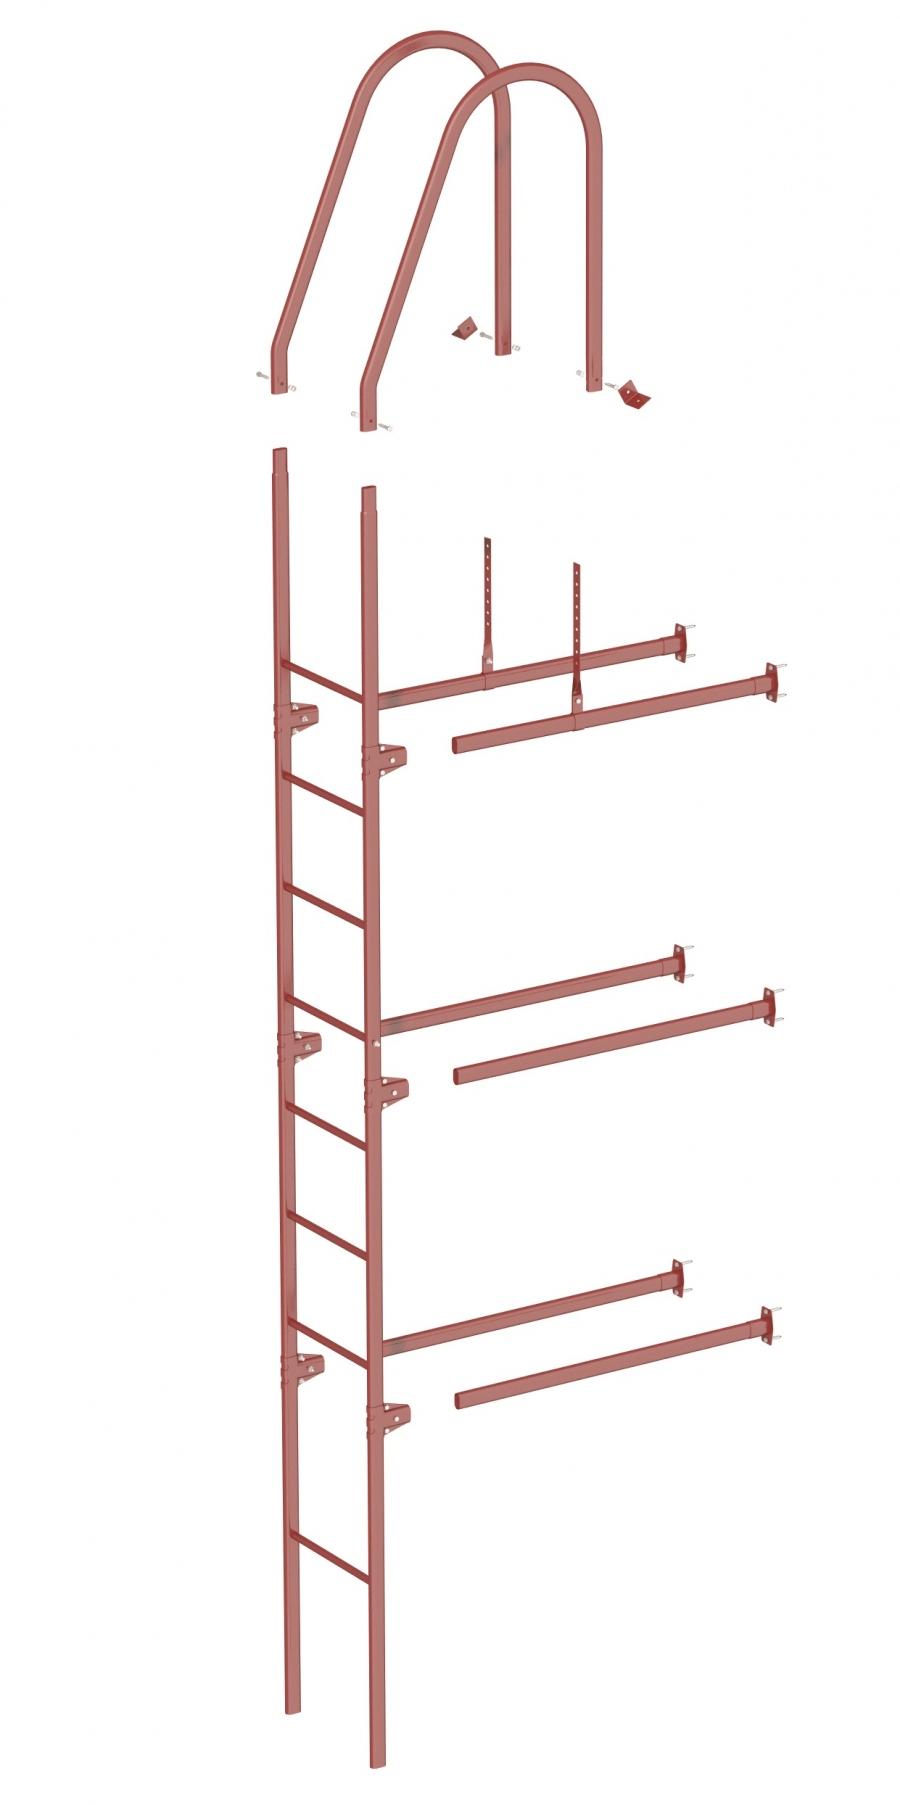 Комплект лестница фасадная BORGE 3 м (верхняя секция)